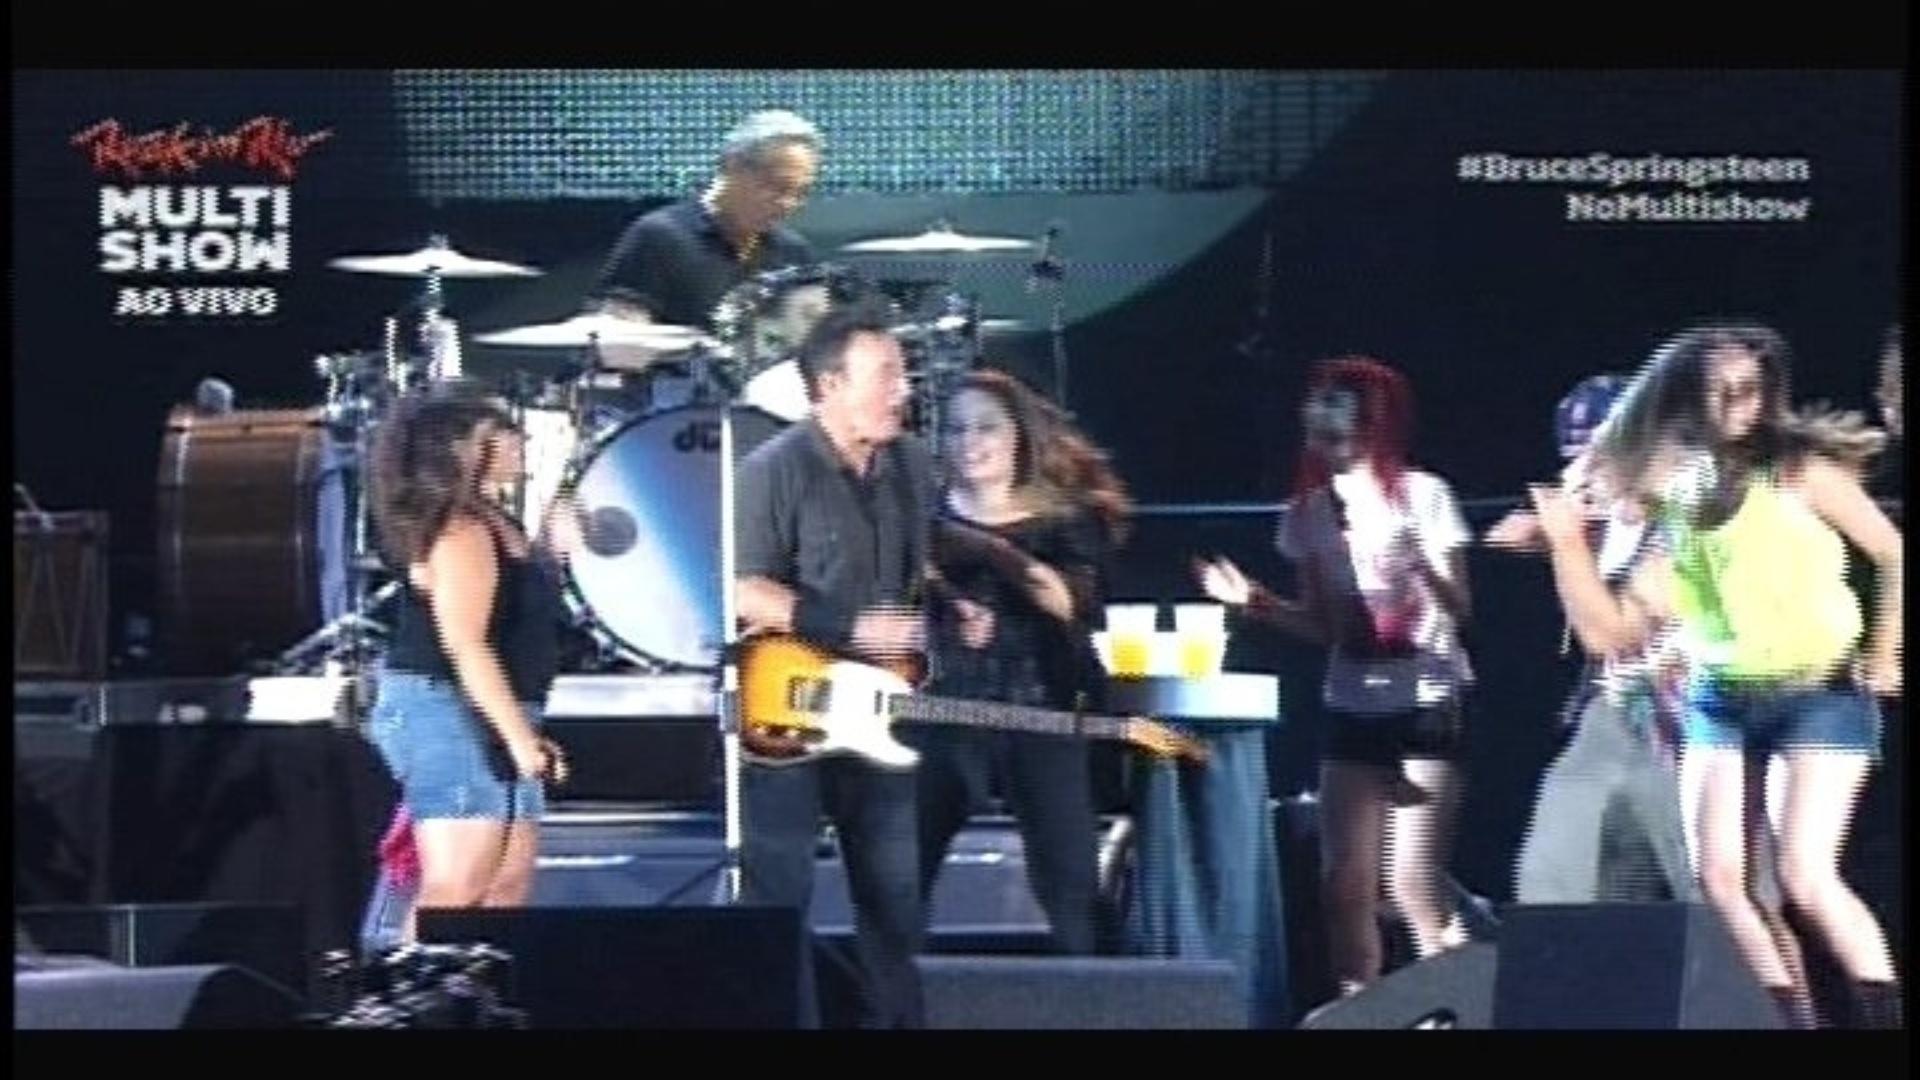 21.set.2013 - Fãs sobem no palco para cantar ao lado de Bruce Springsteen no Rock in Rio